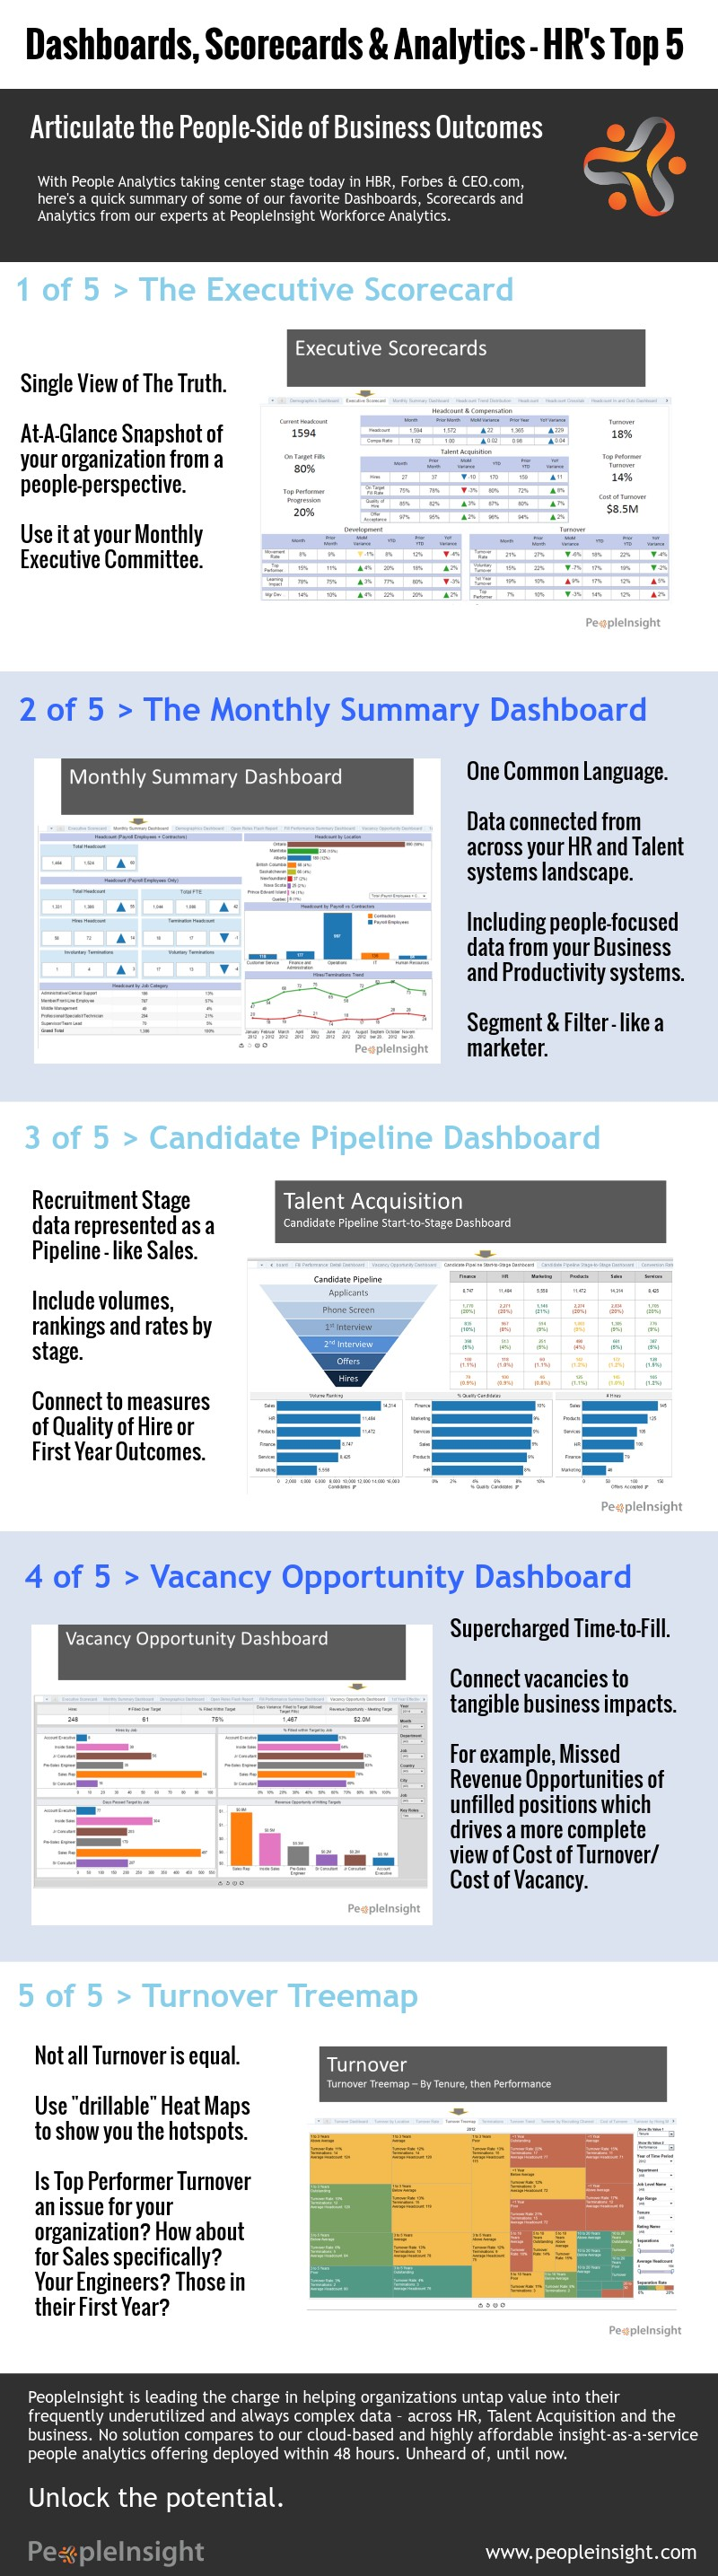 Top_5_HR_Dash_Info_Aug_2015